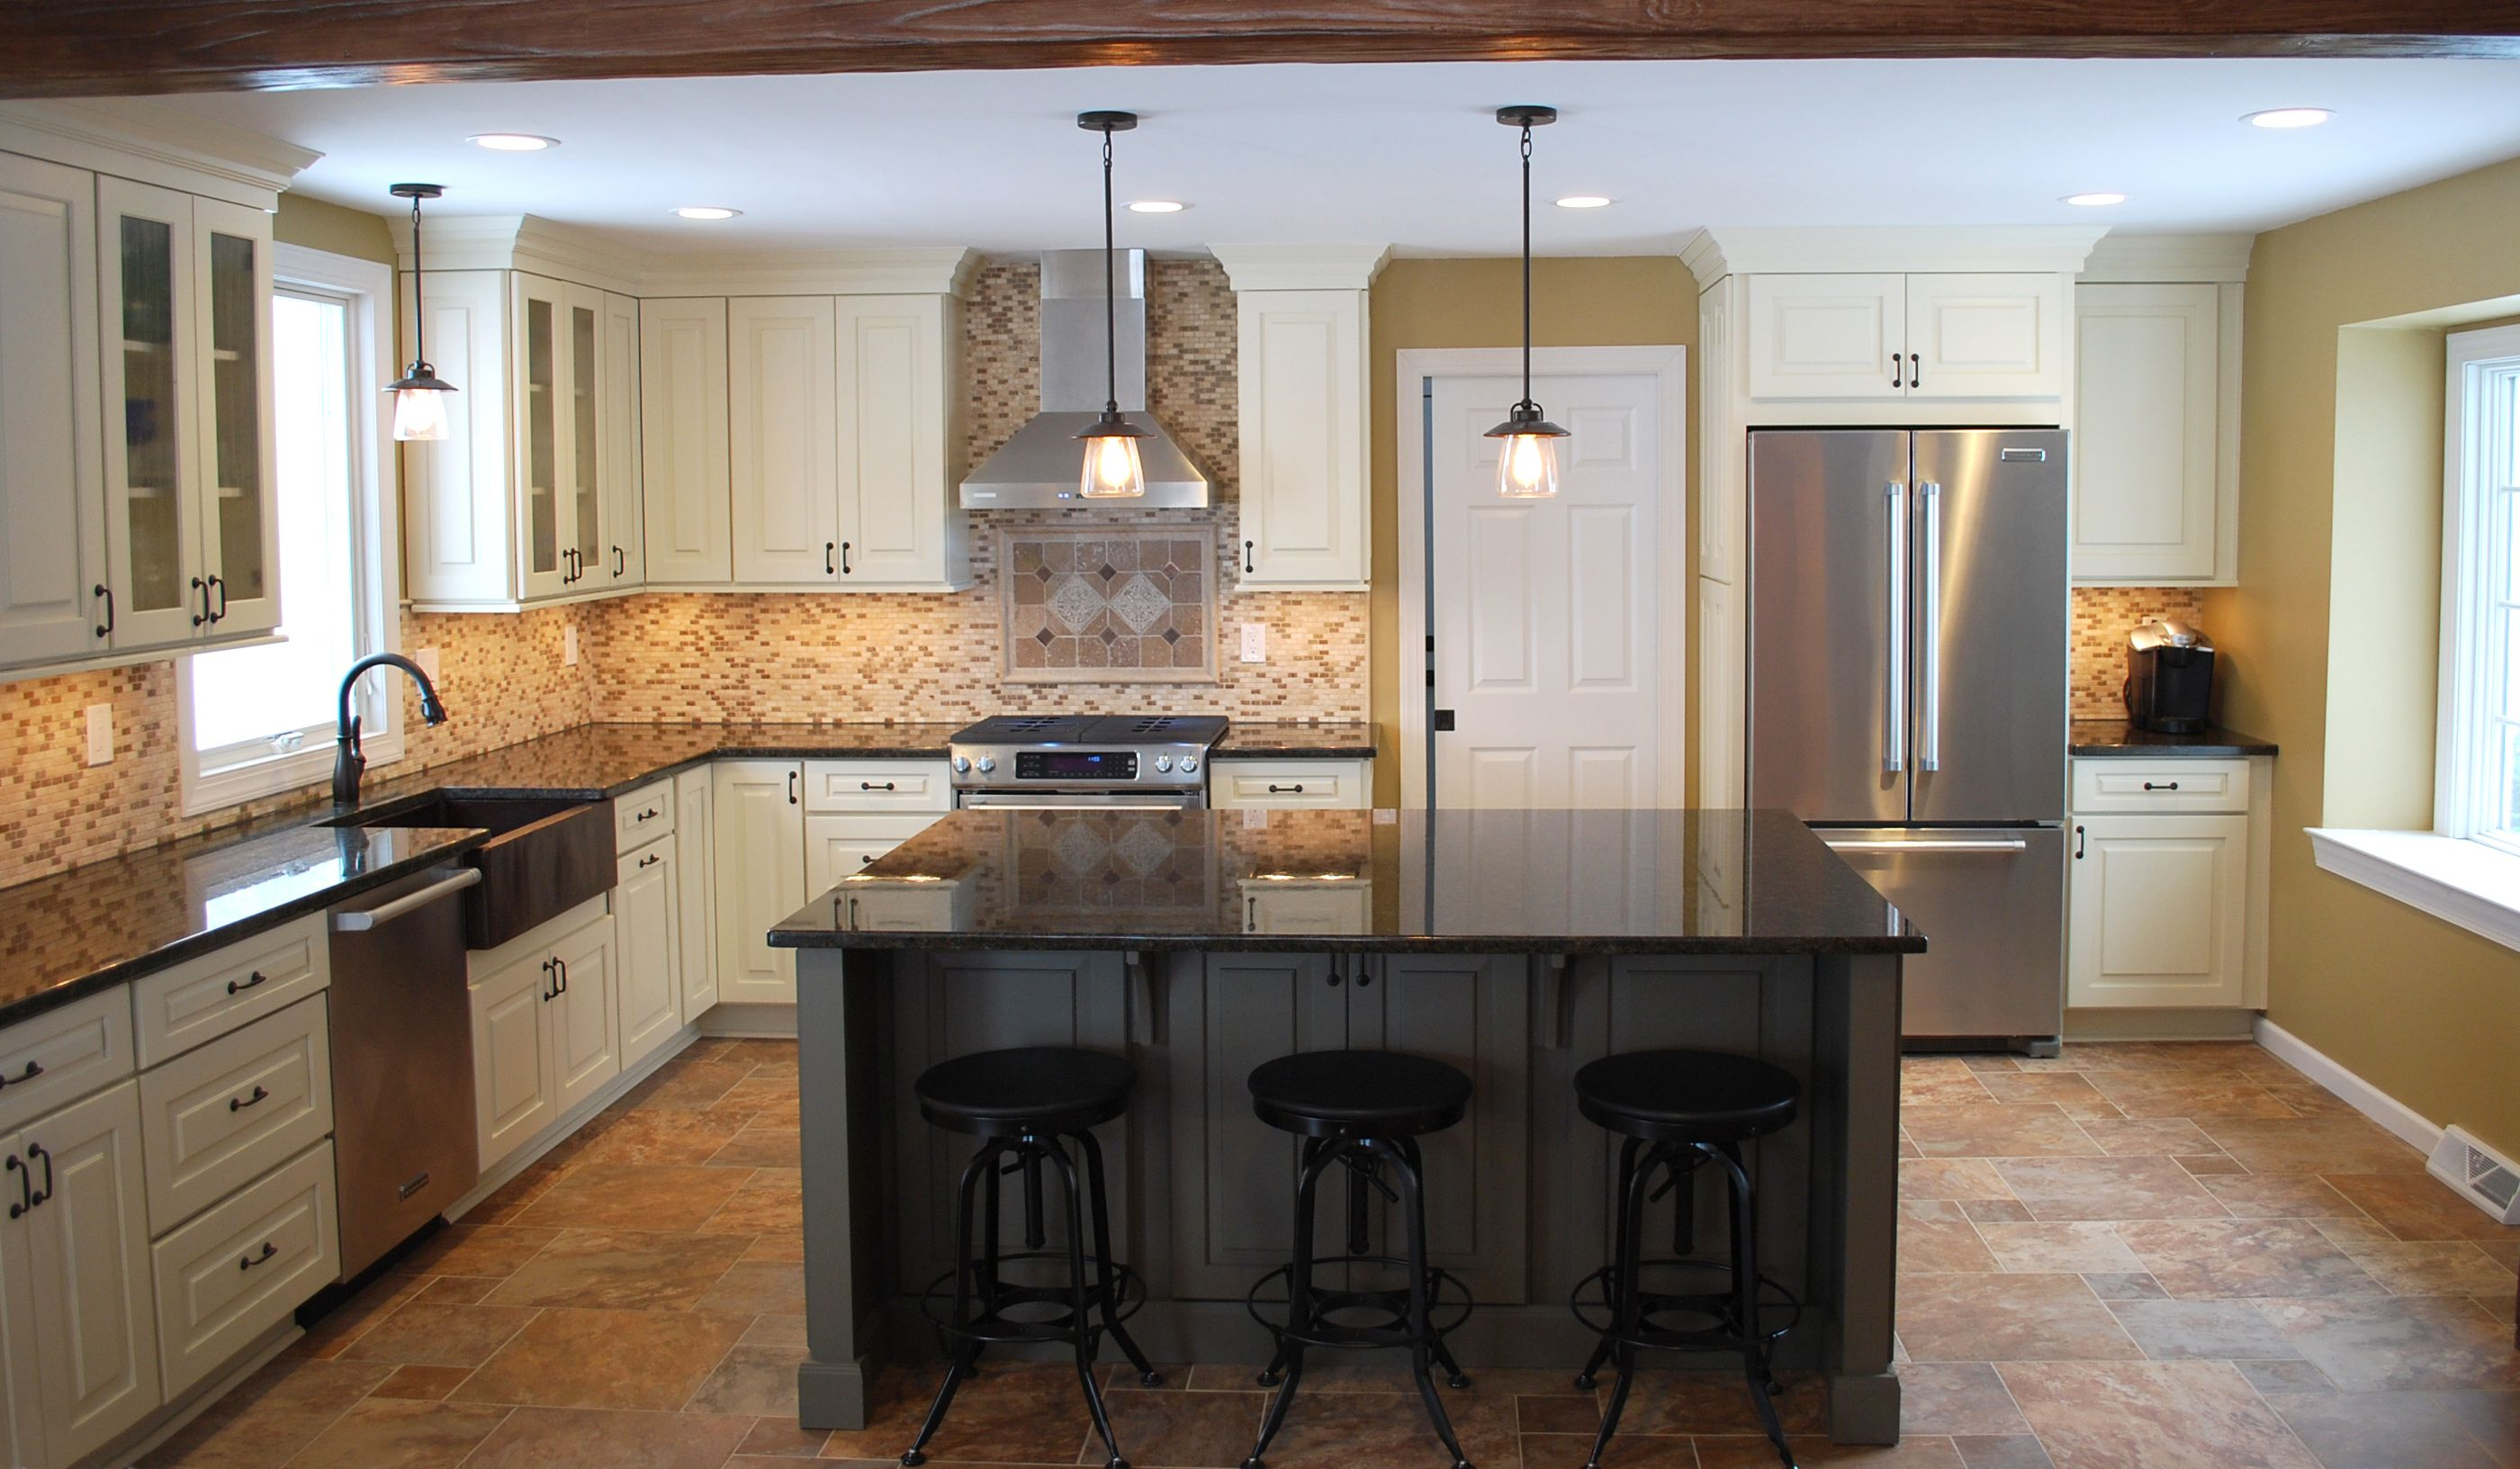 Kitchen Cabinets Kitchen Cabinets Prices White Kitchen Cabinet Doors Quality Kitchen Cabinets